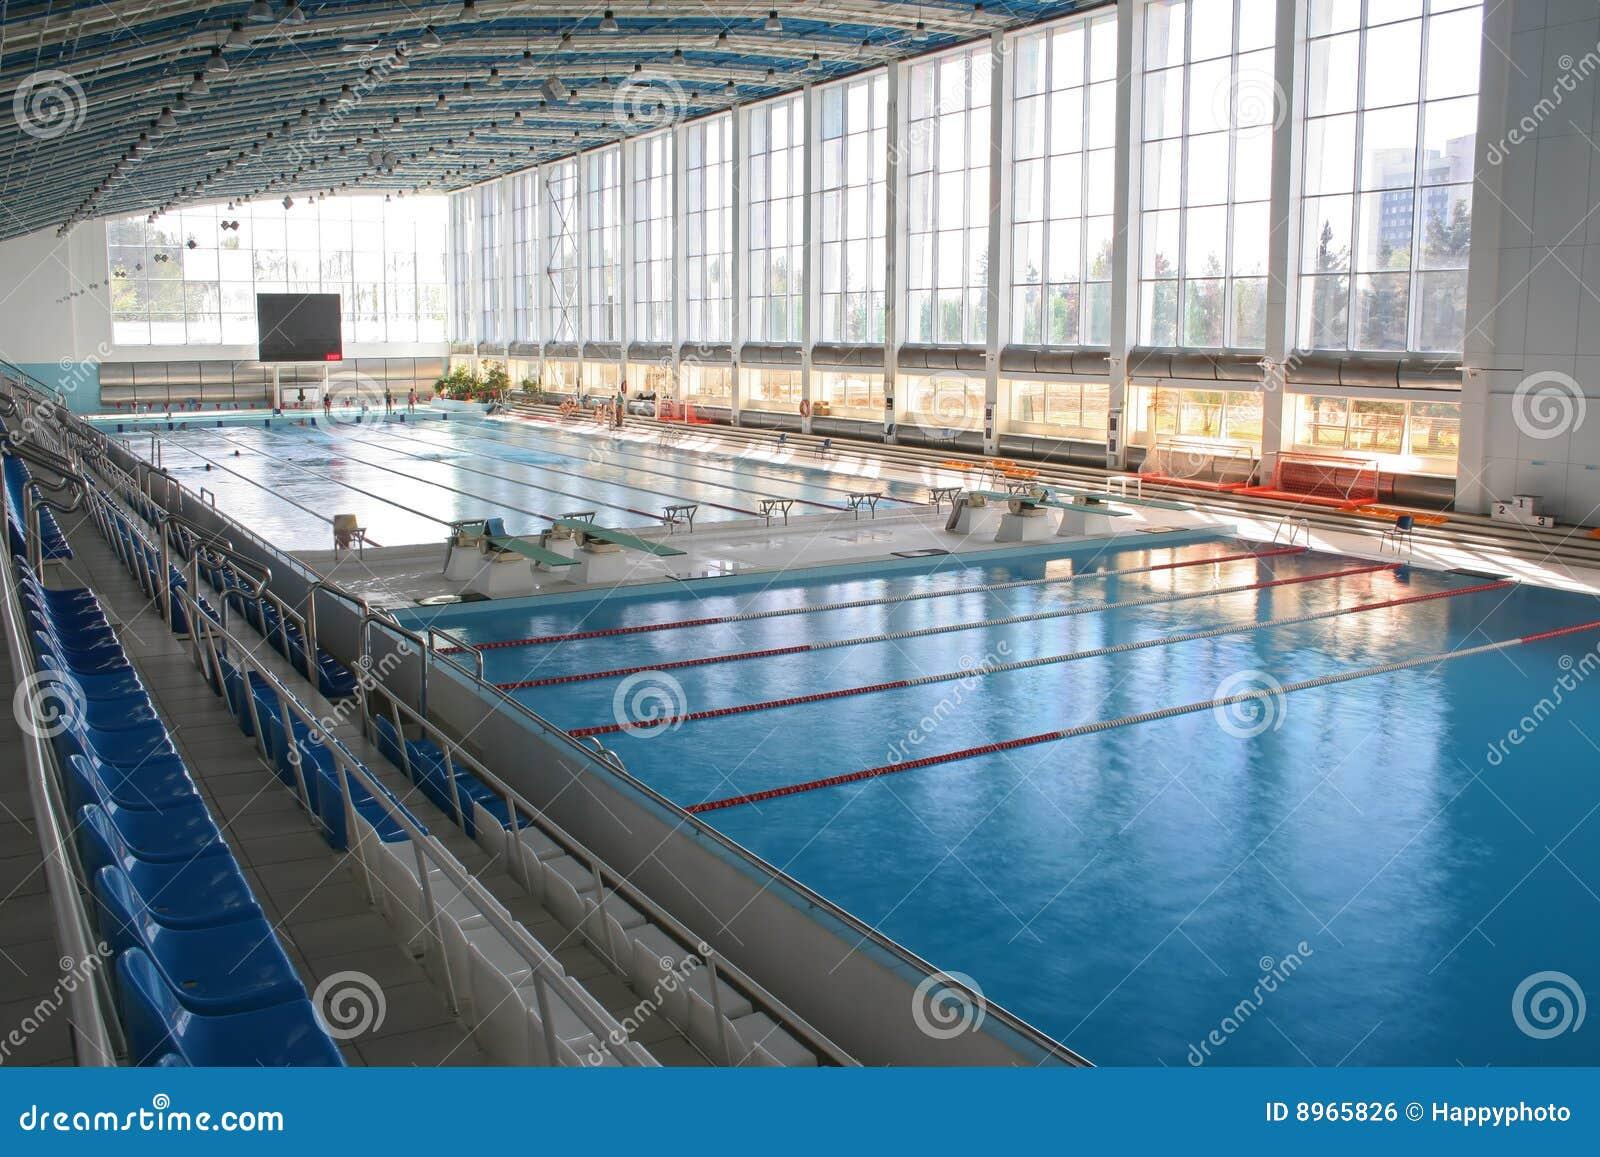 Groot modern zwembad royalty vrije stock afbeelding afbeelding 8965826 for Modern zwembad